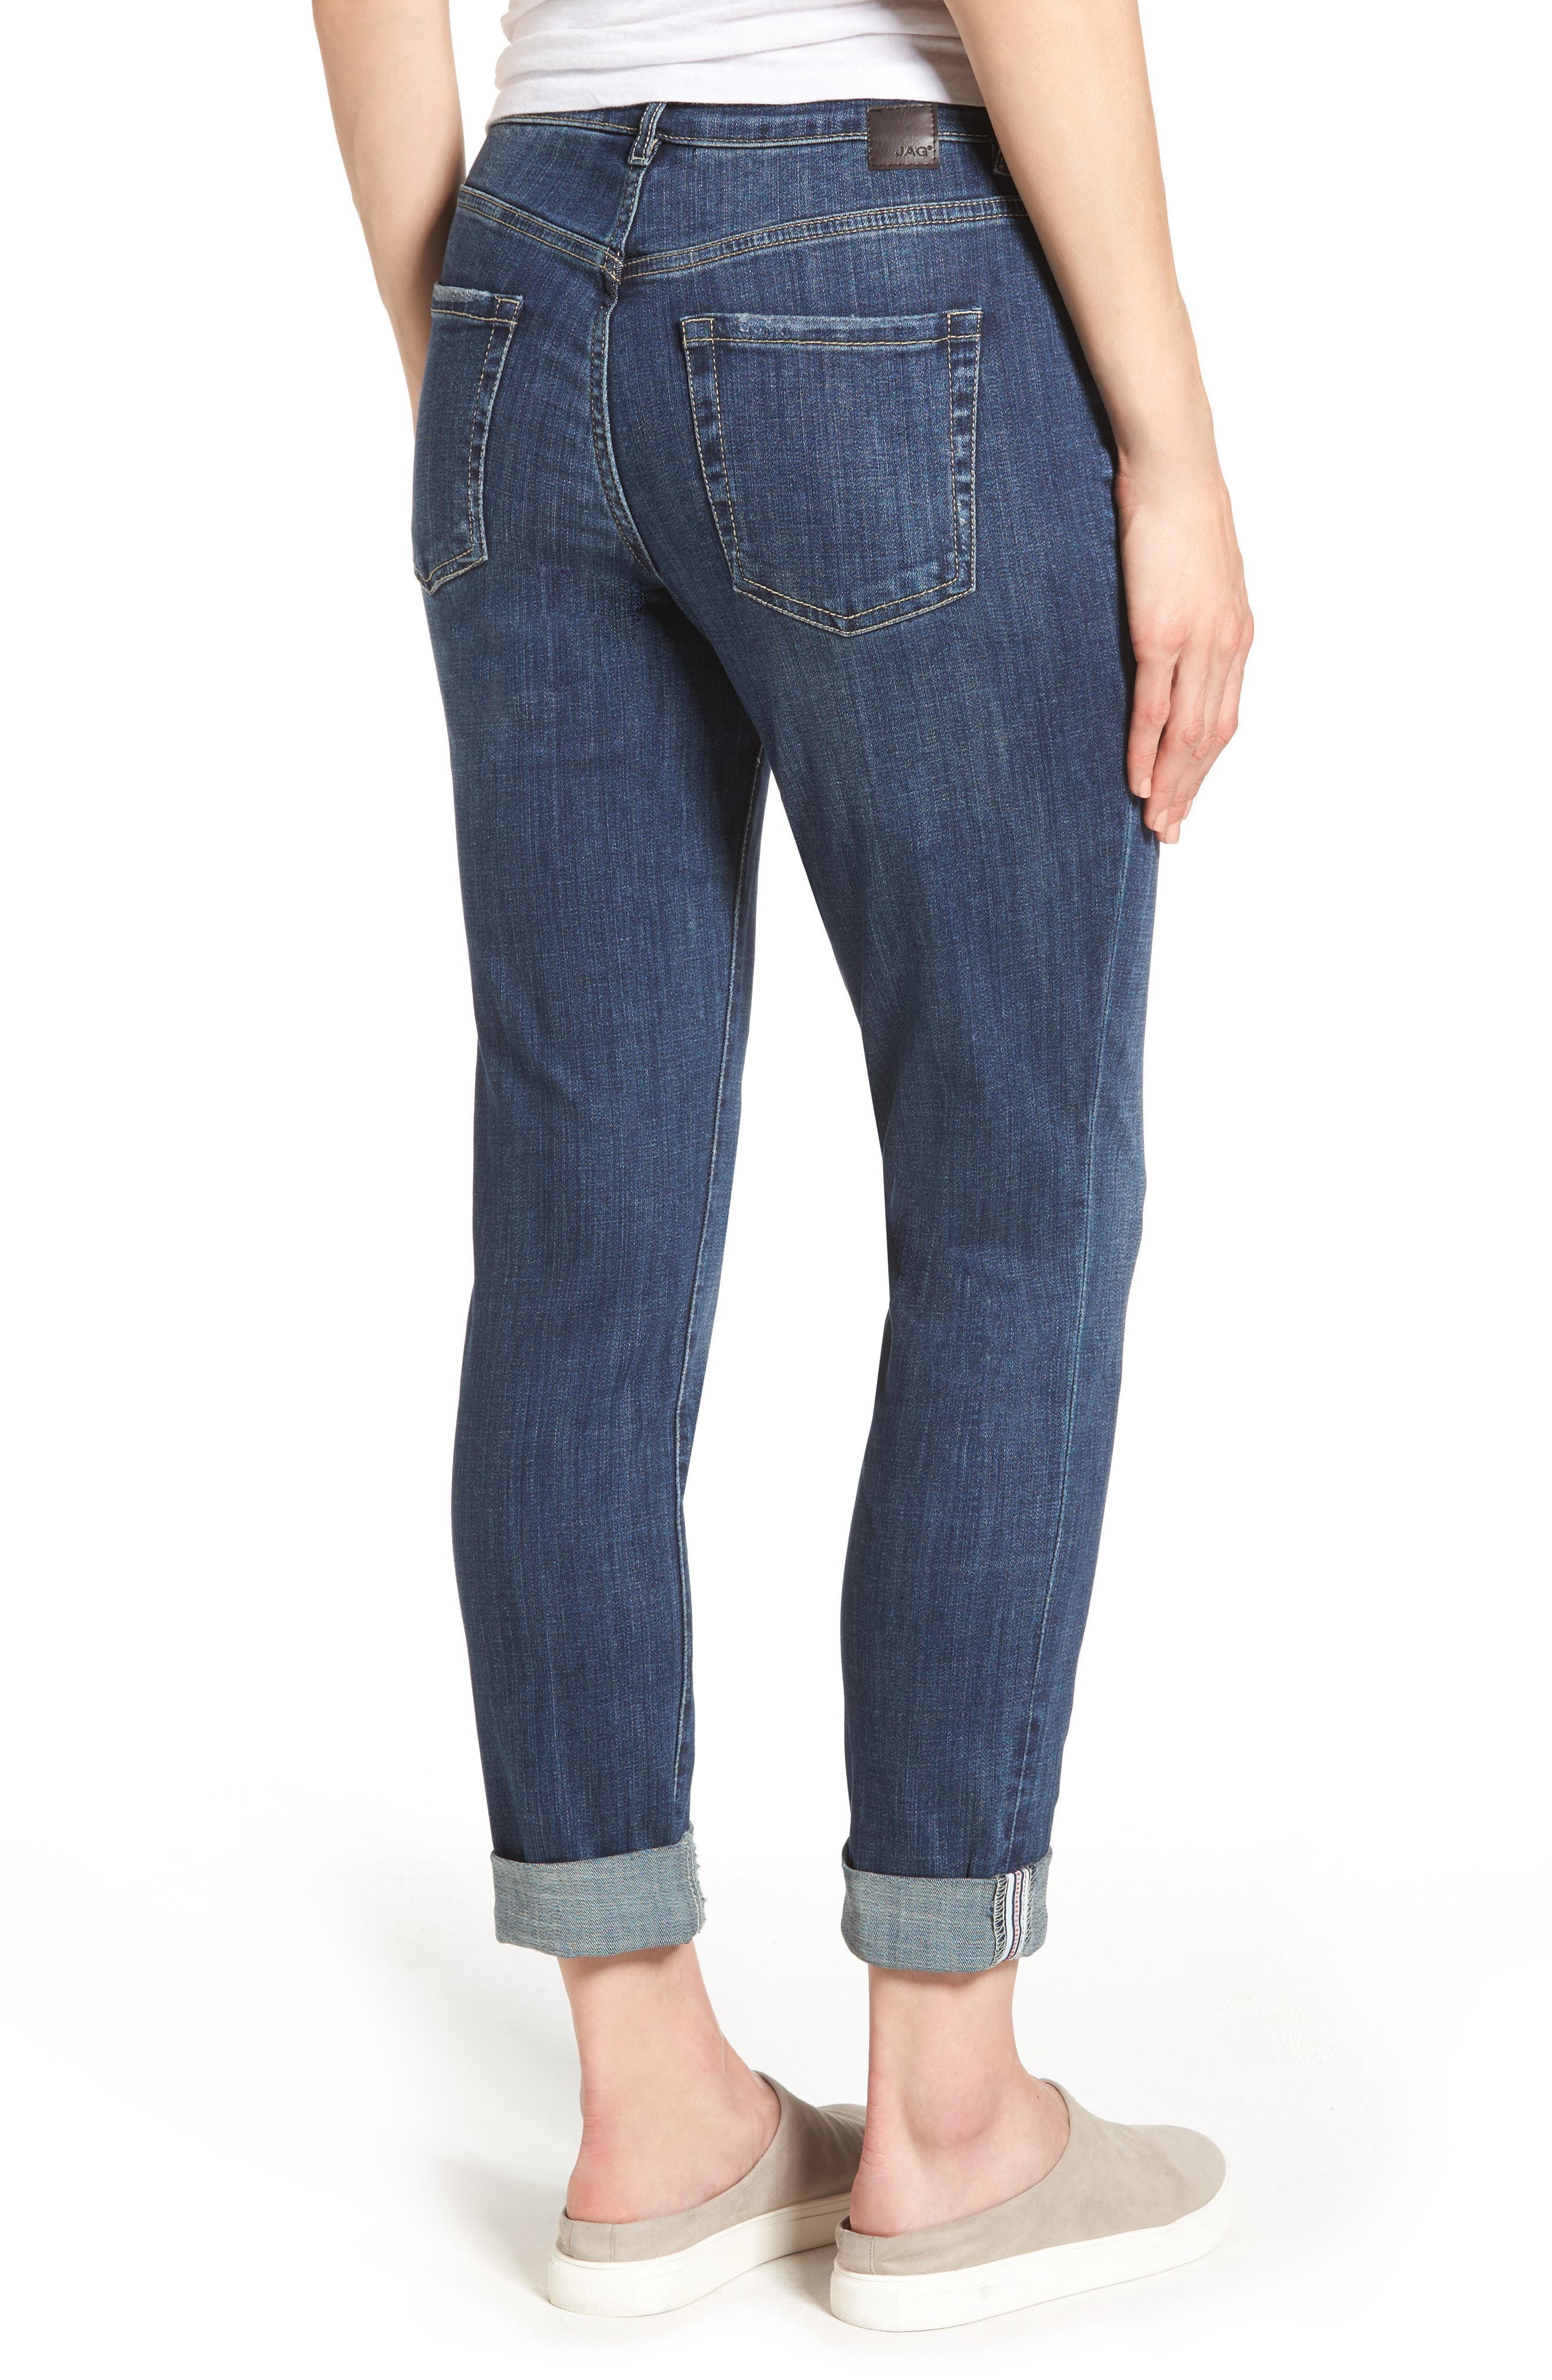 Carter Cuffed Stretch Girlfriend Jeans,                             Alternate thumbnail 2, color,                             MEDIUM INDIGO